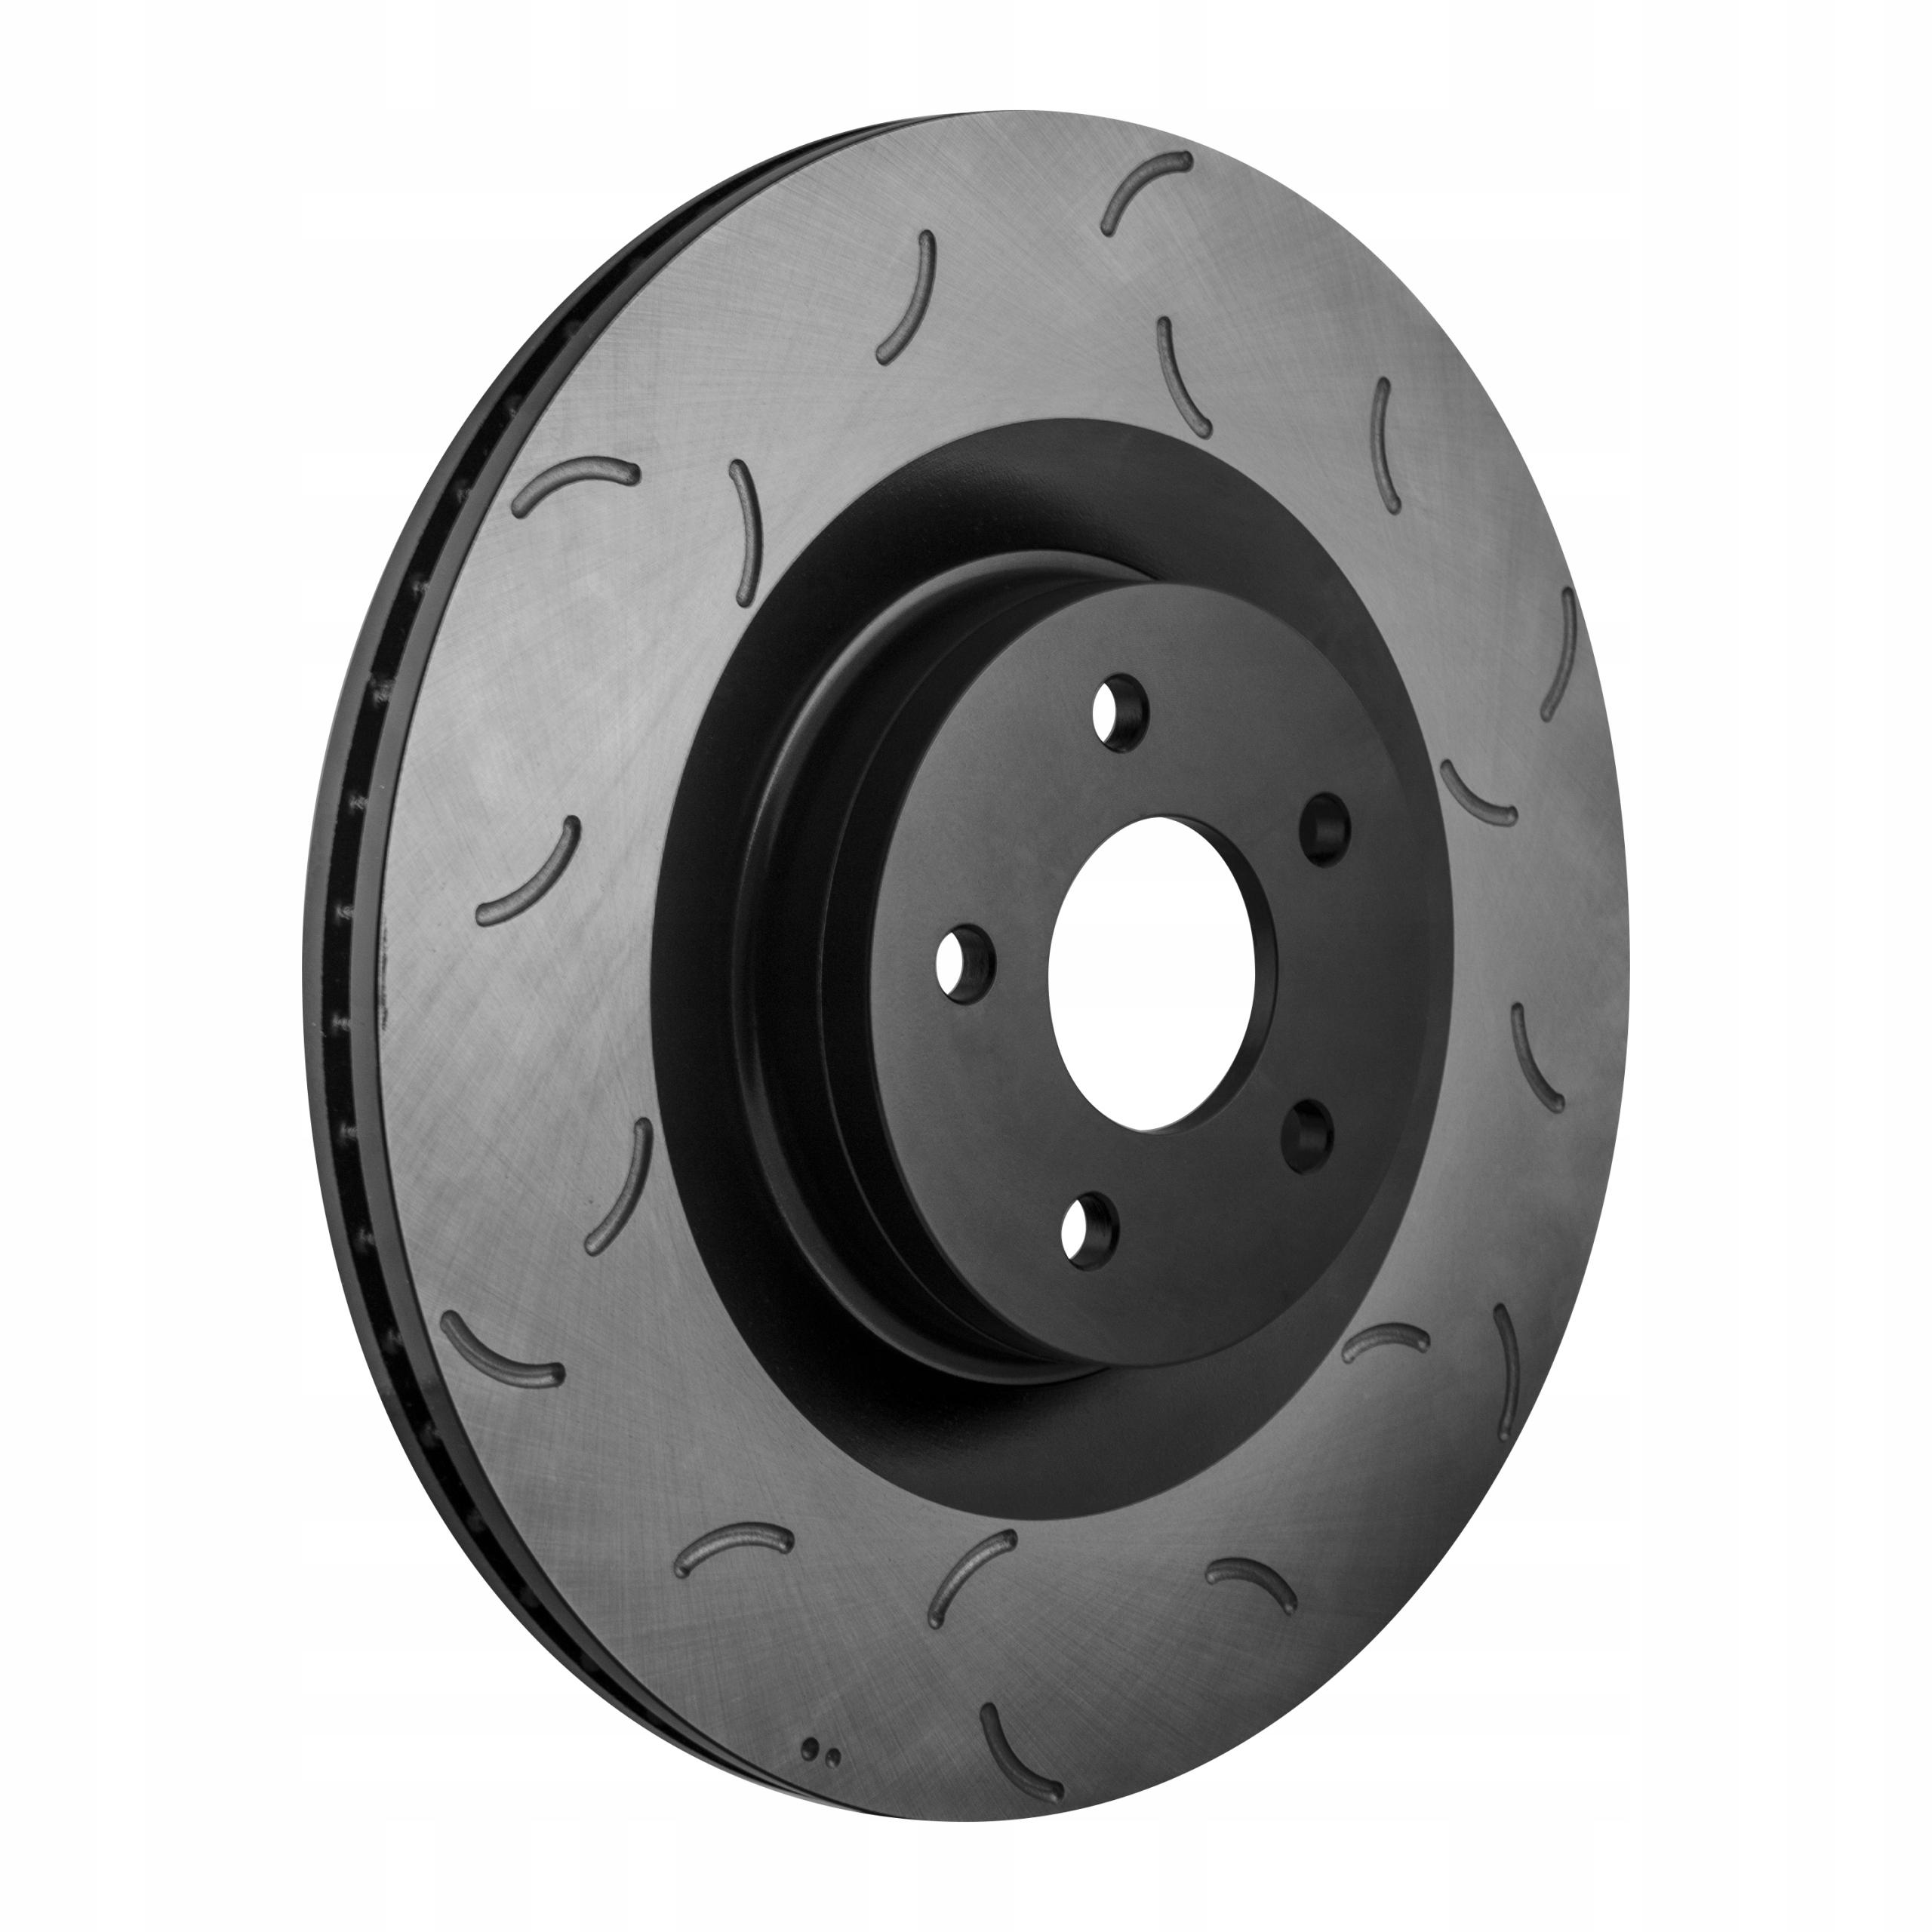 диски dark ultra сзади lexus ls460 ls600h 07- 335mm